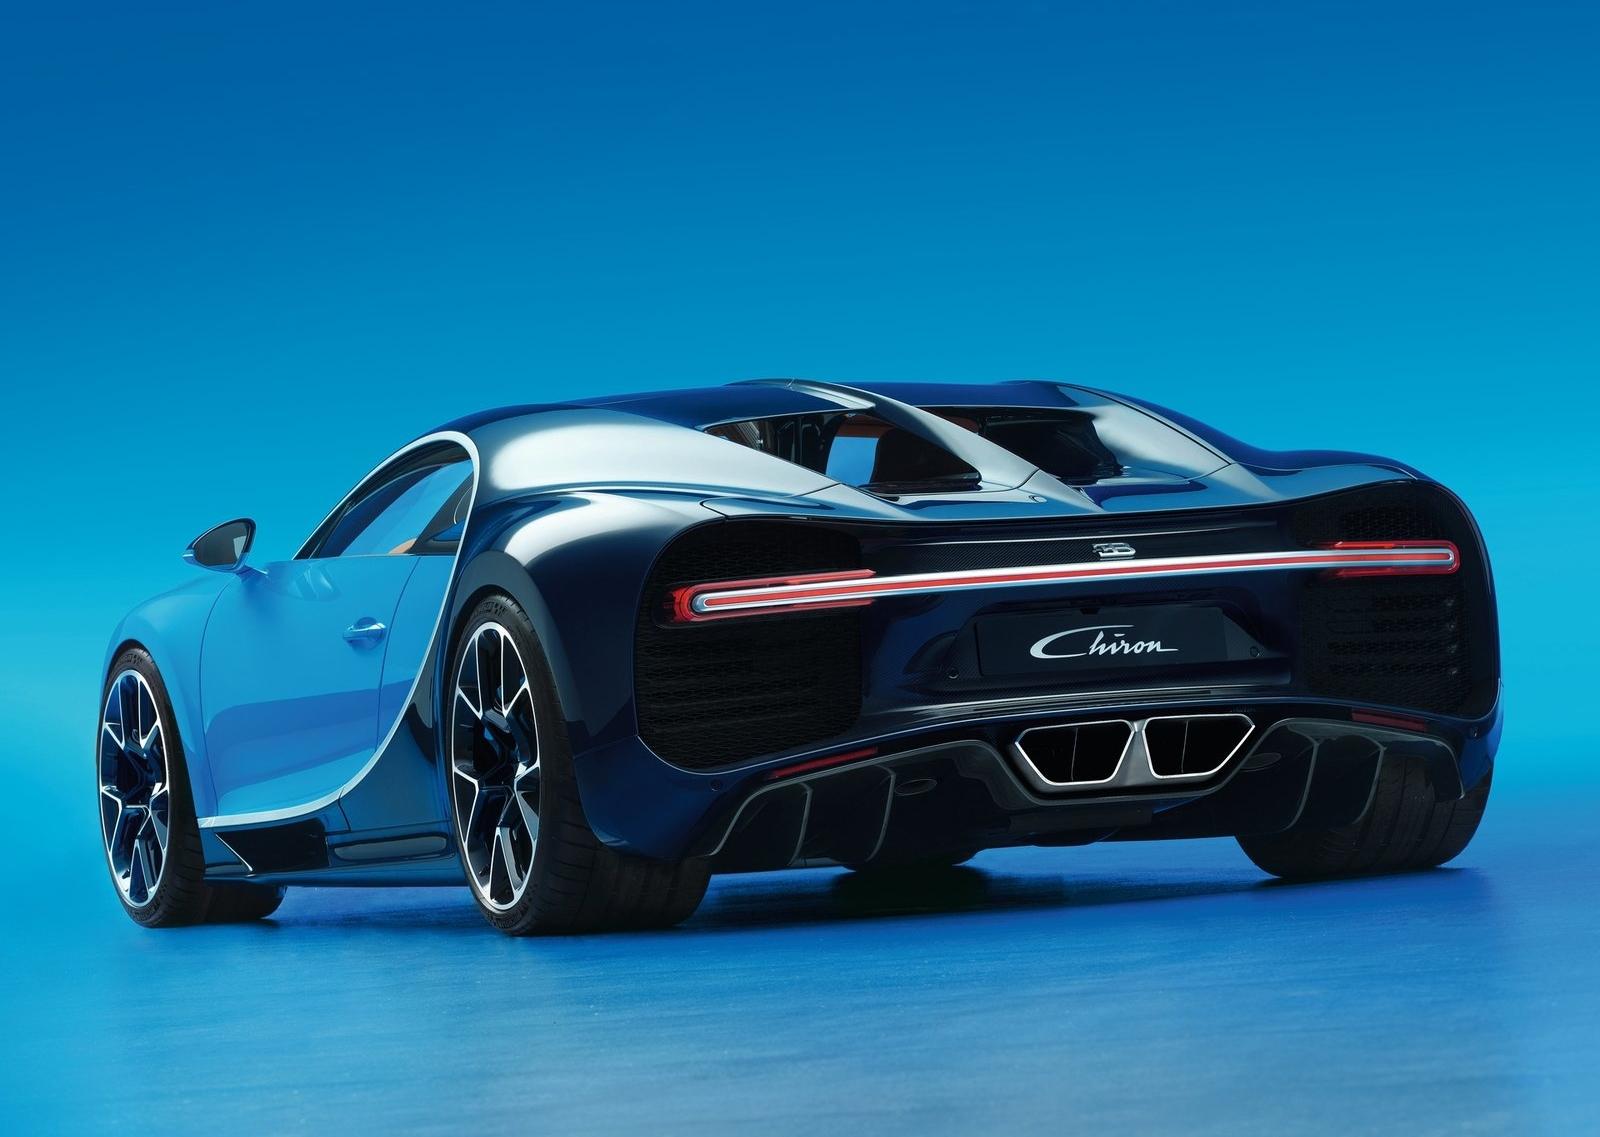 Bugatti Chiron Wallpapers HQ